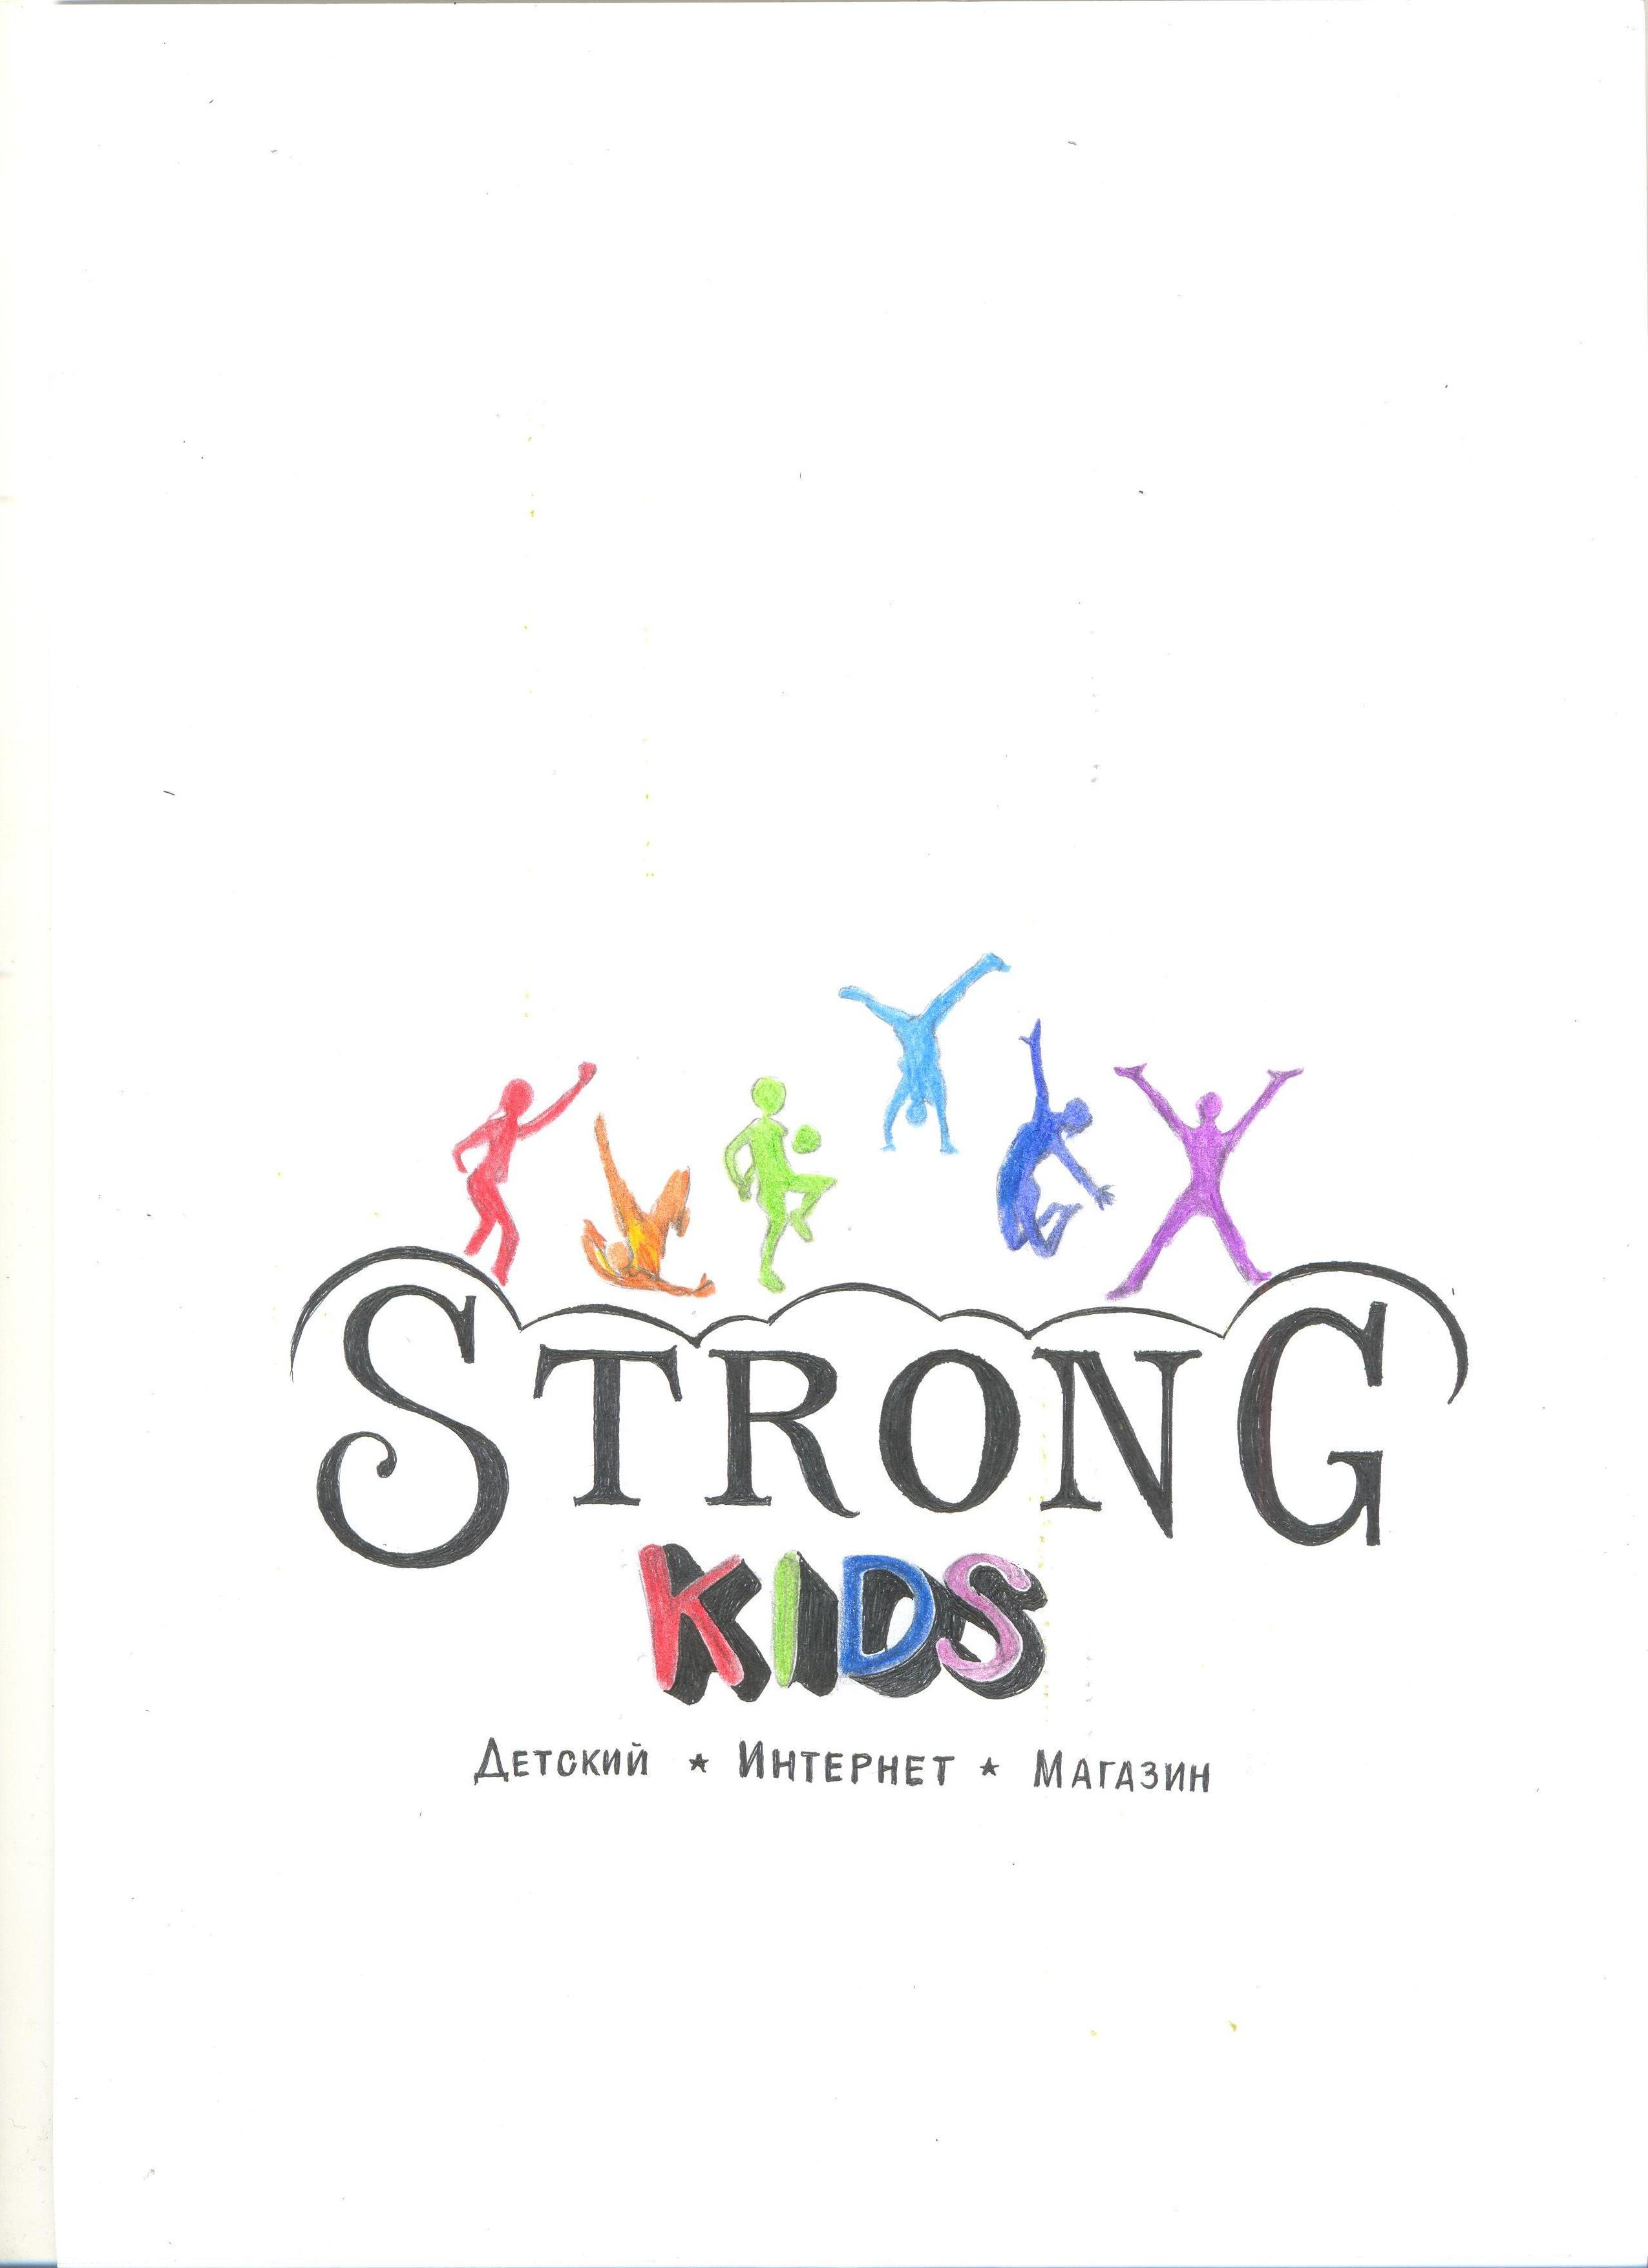 Логотип для Детского Интернет Магазина StrongKids фото f_9605c6a7a774f6da.jpg